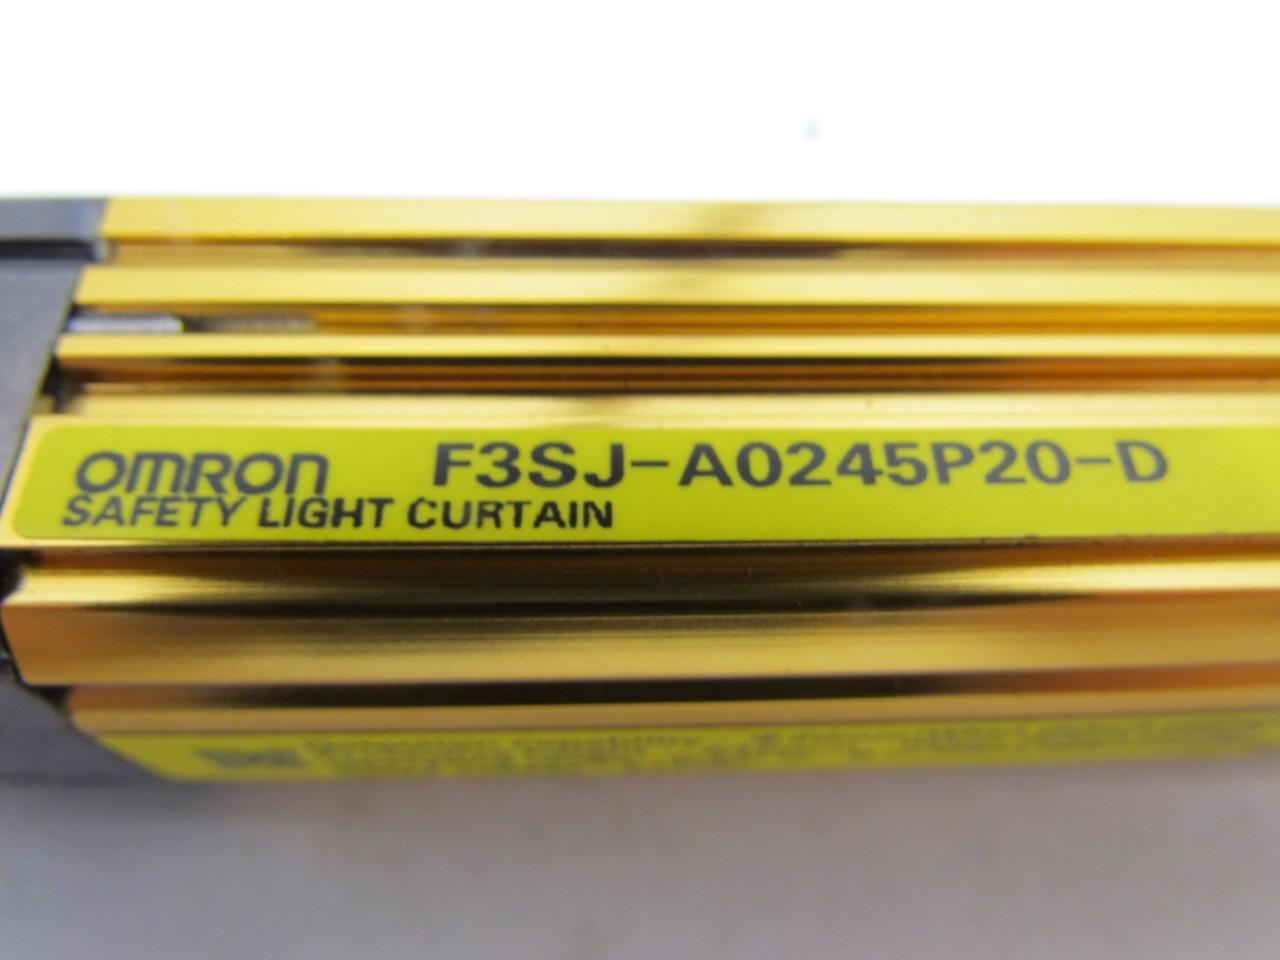 omron sti f3sj a0245p20 d safety light curtain receiver. Black Bedroom Furniture Sets. Home Design Ideas